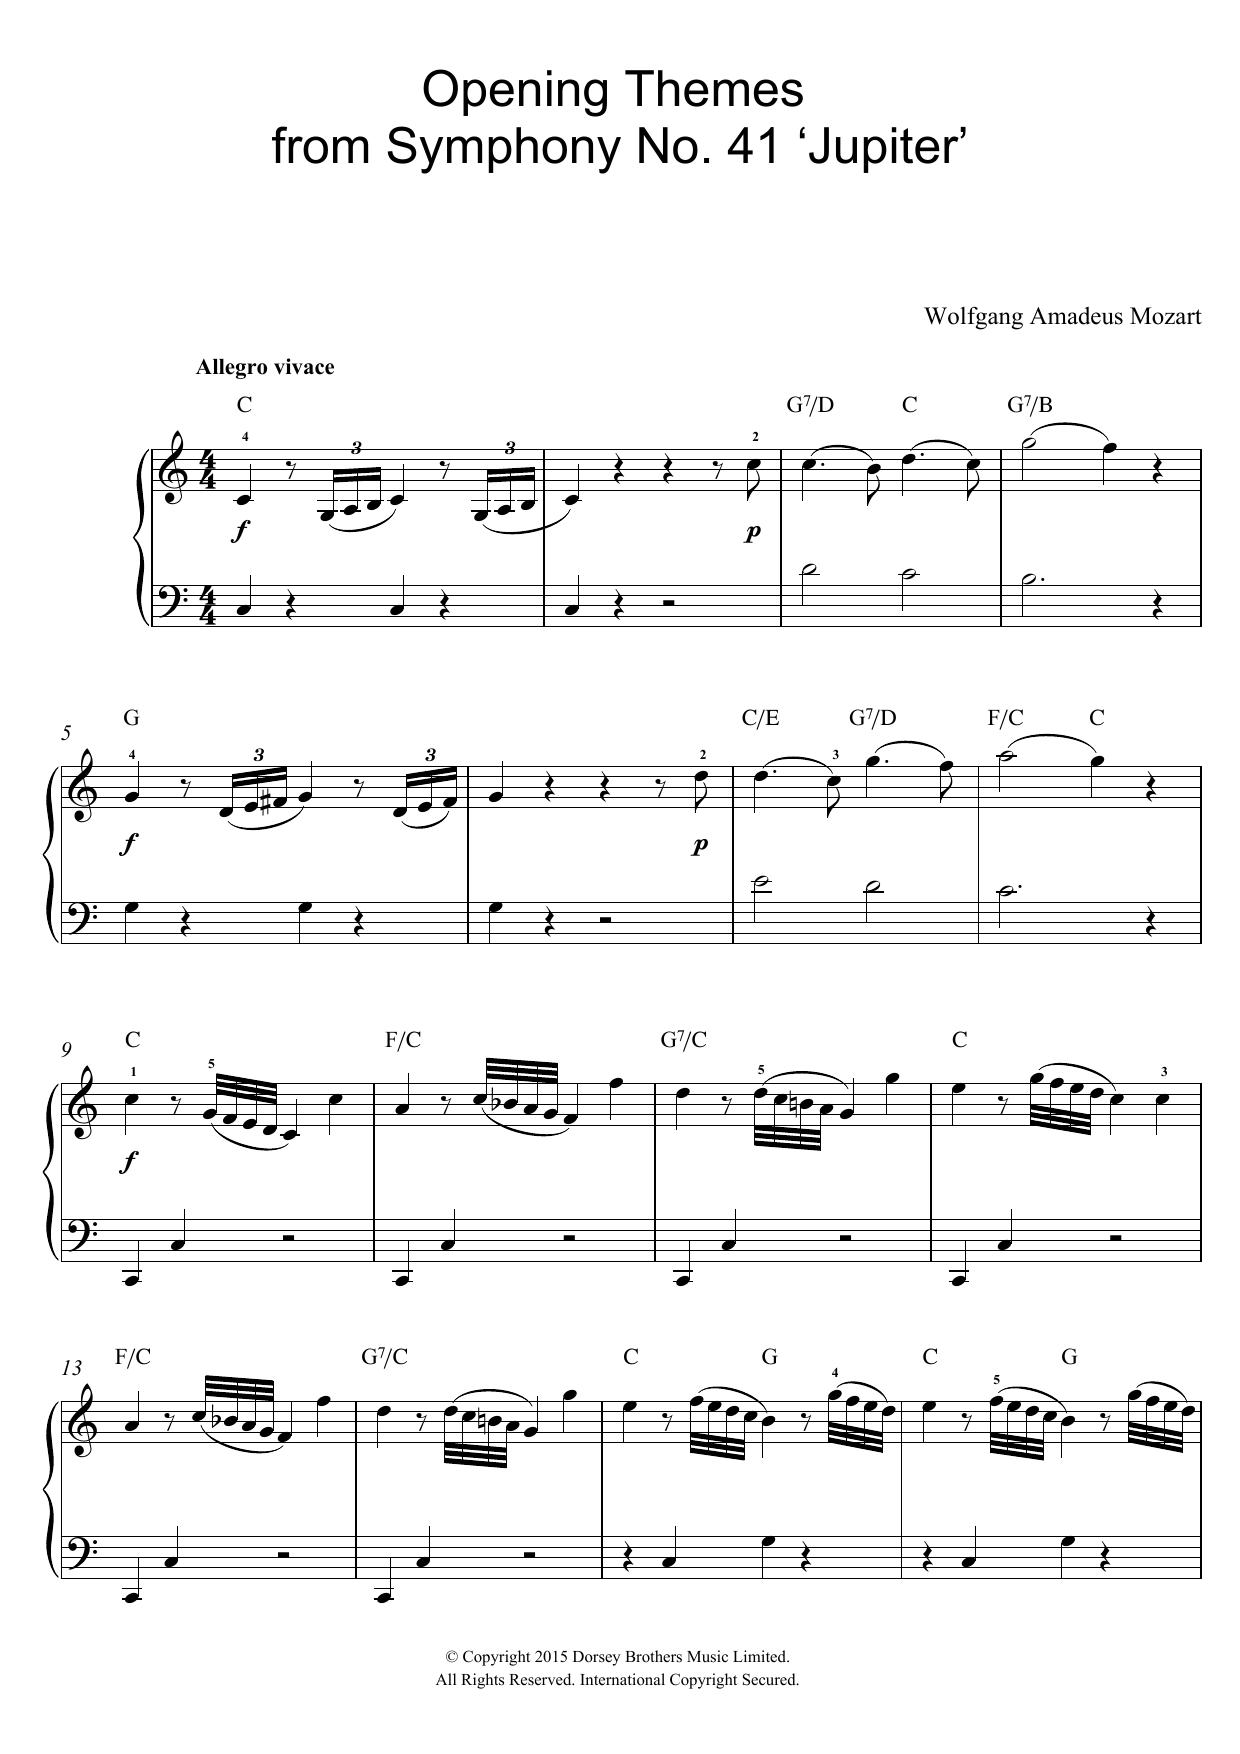 Wolfgang Amadeus Mozart: Opening Themes from Symphony No. 41 'Jupiter'